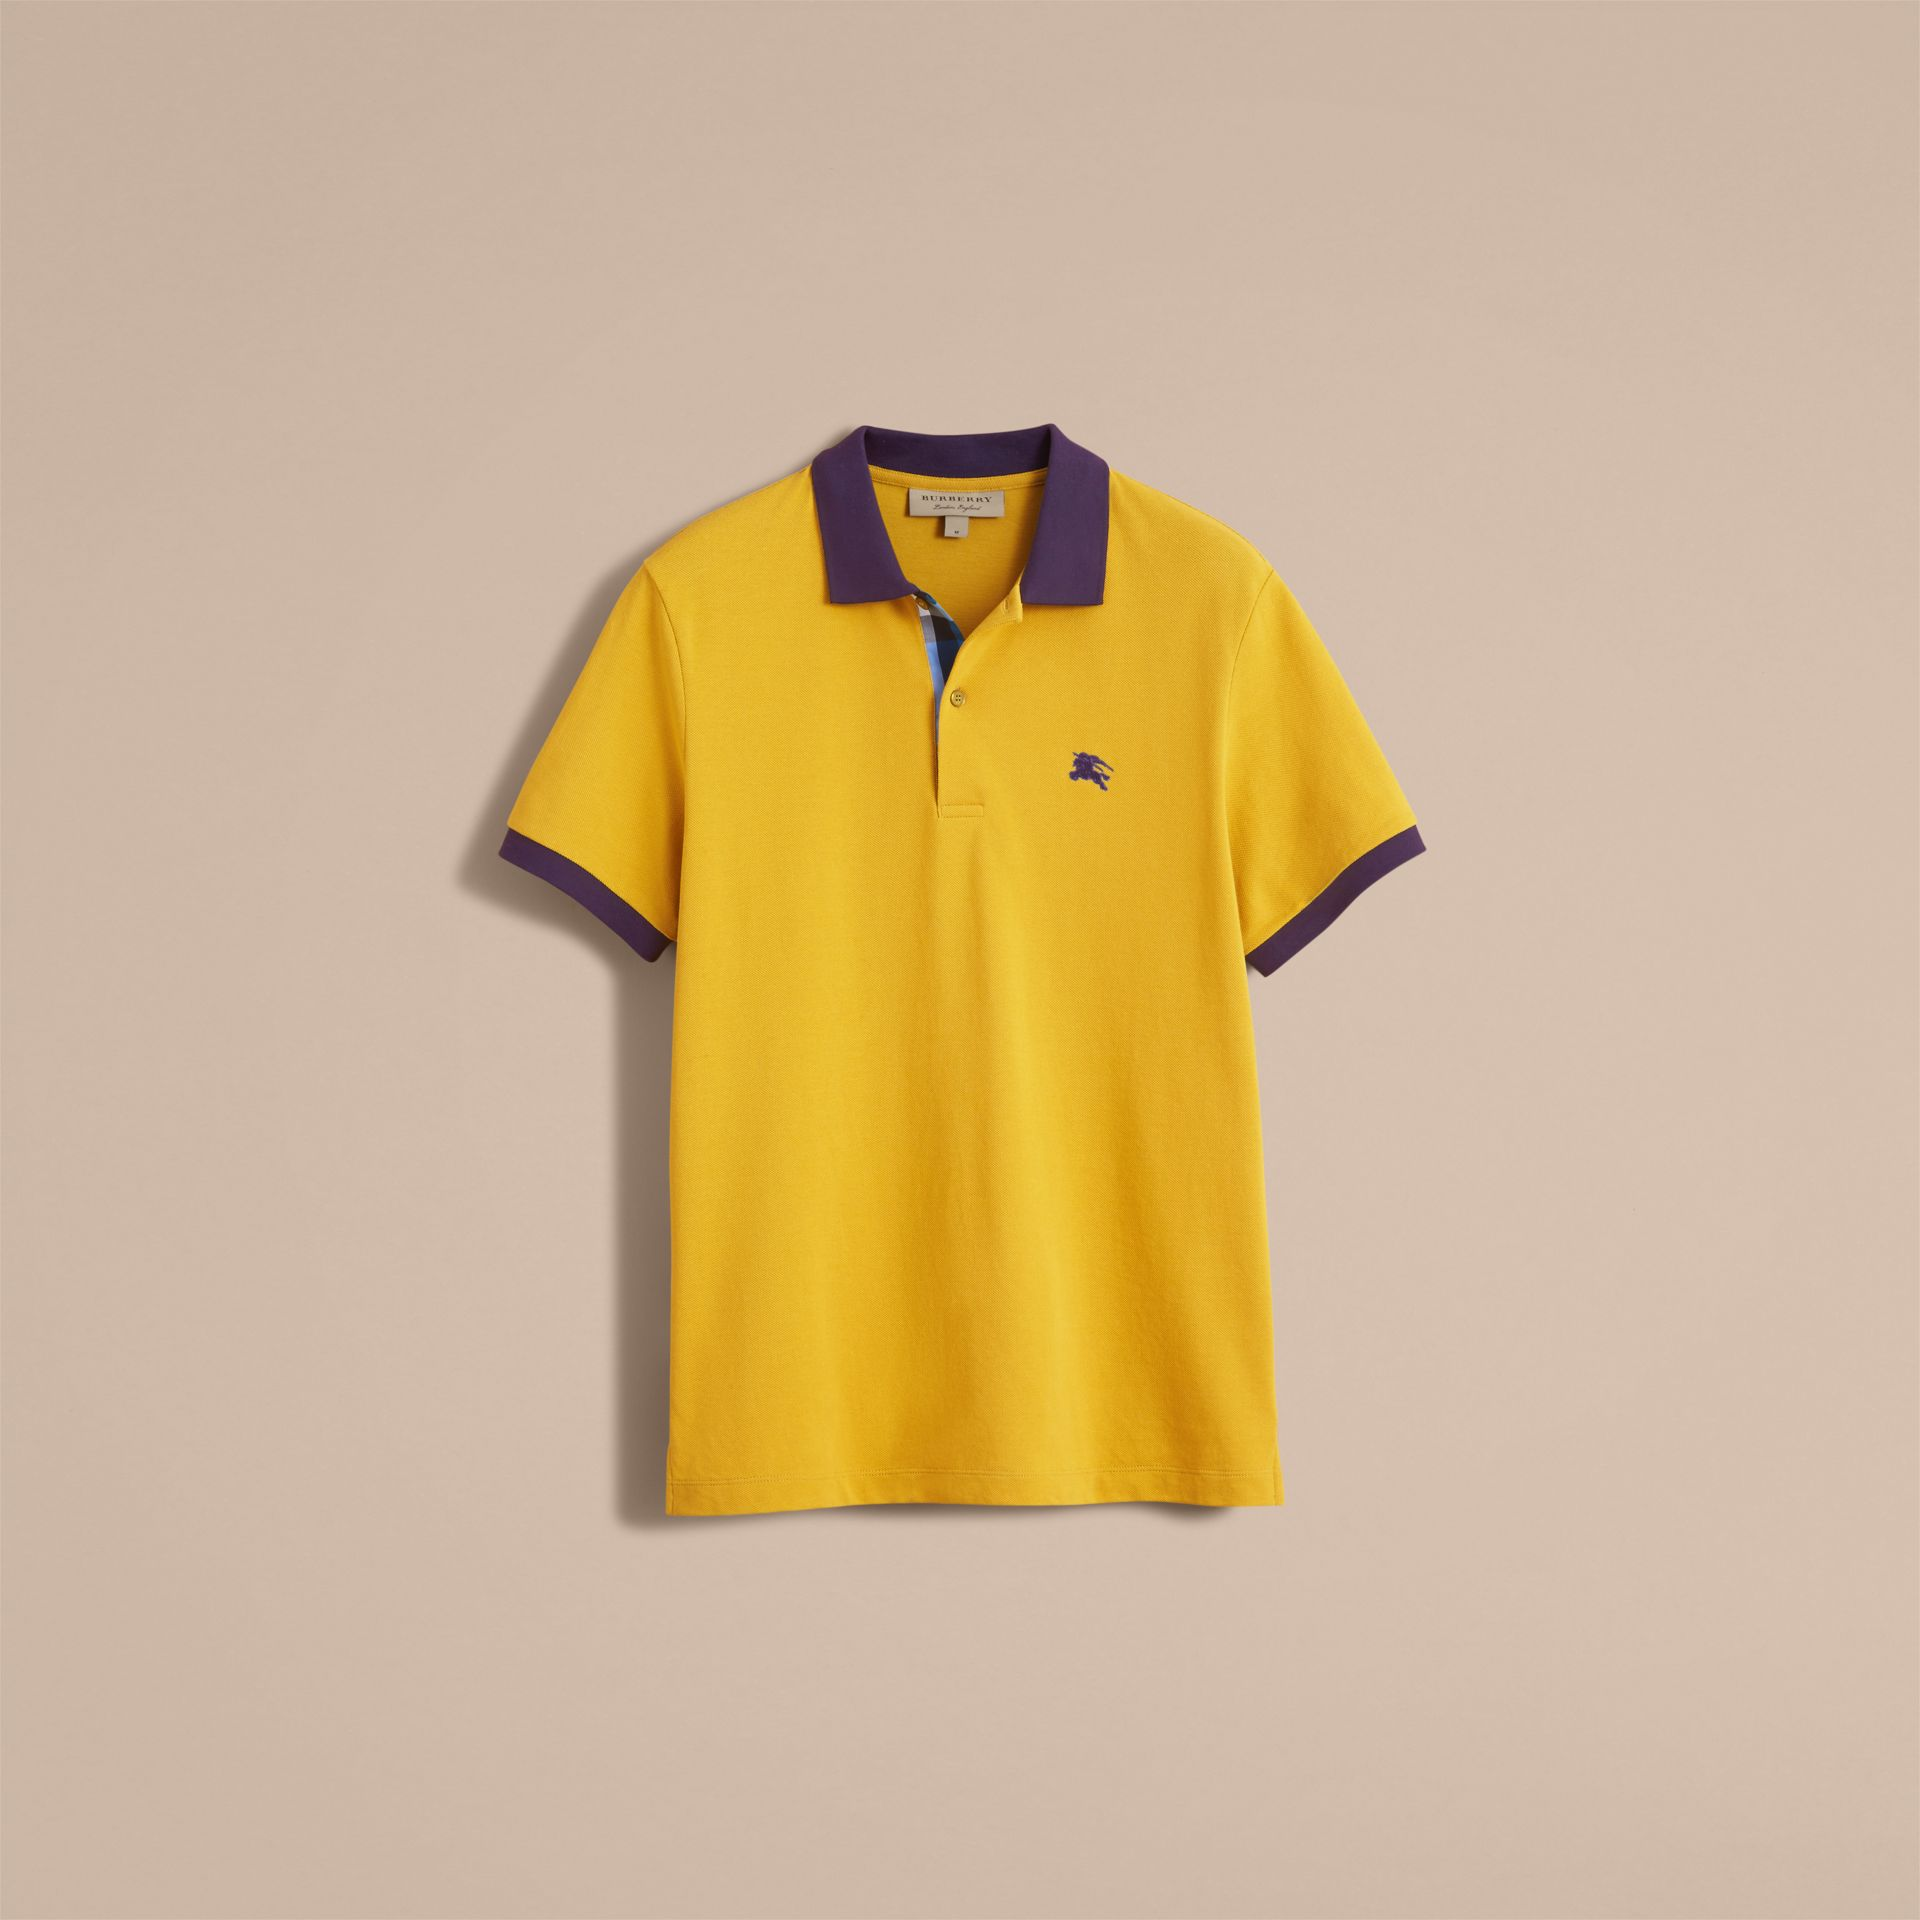 Two-tone Check Placket Cotton Piqué Polo Shirt Gorse Yellow - gallery image 4